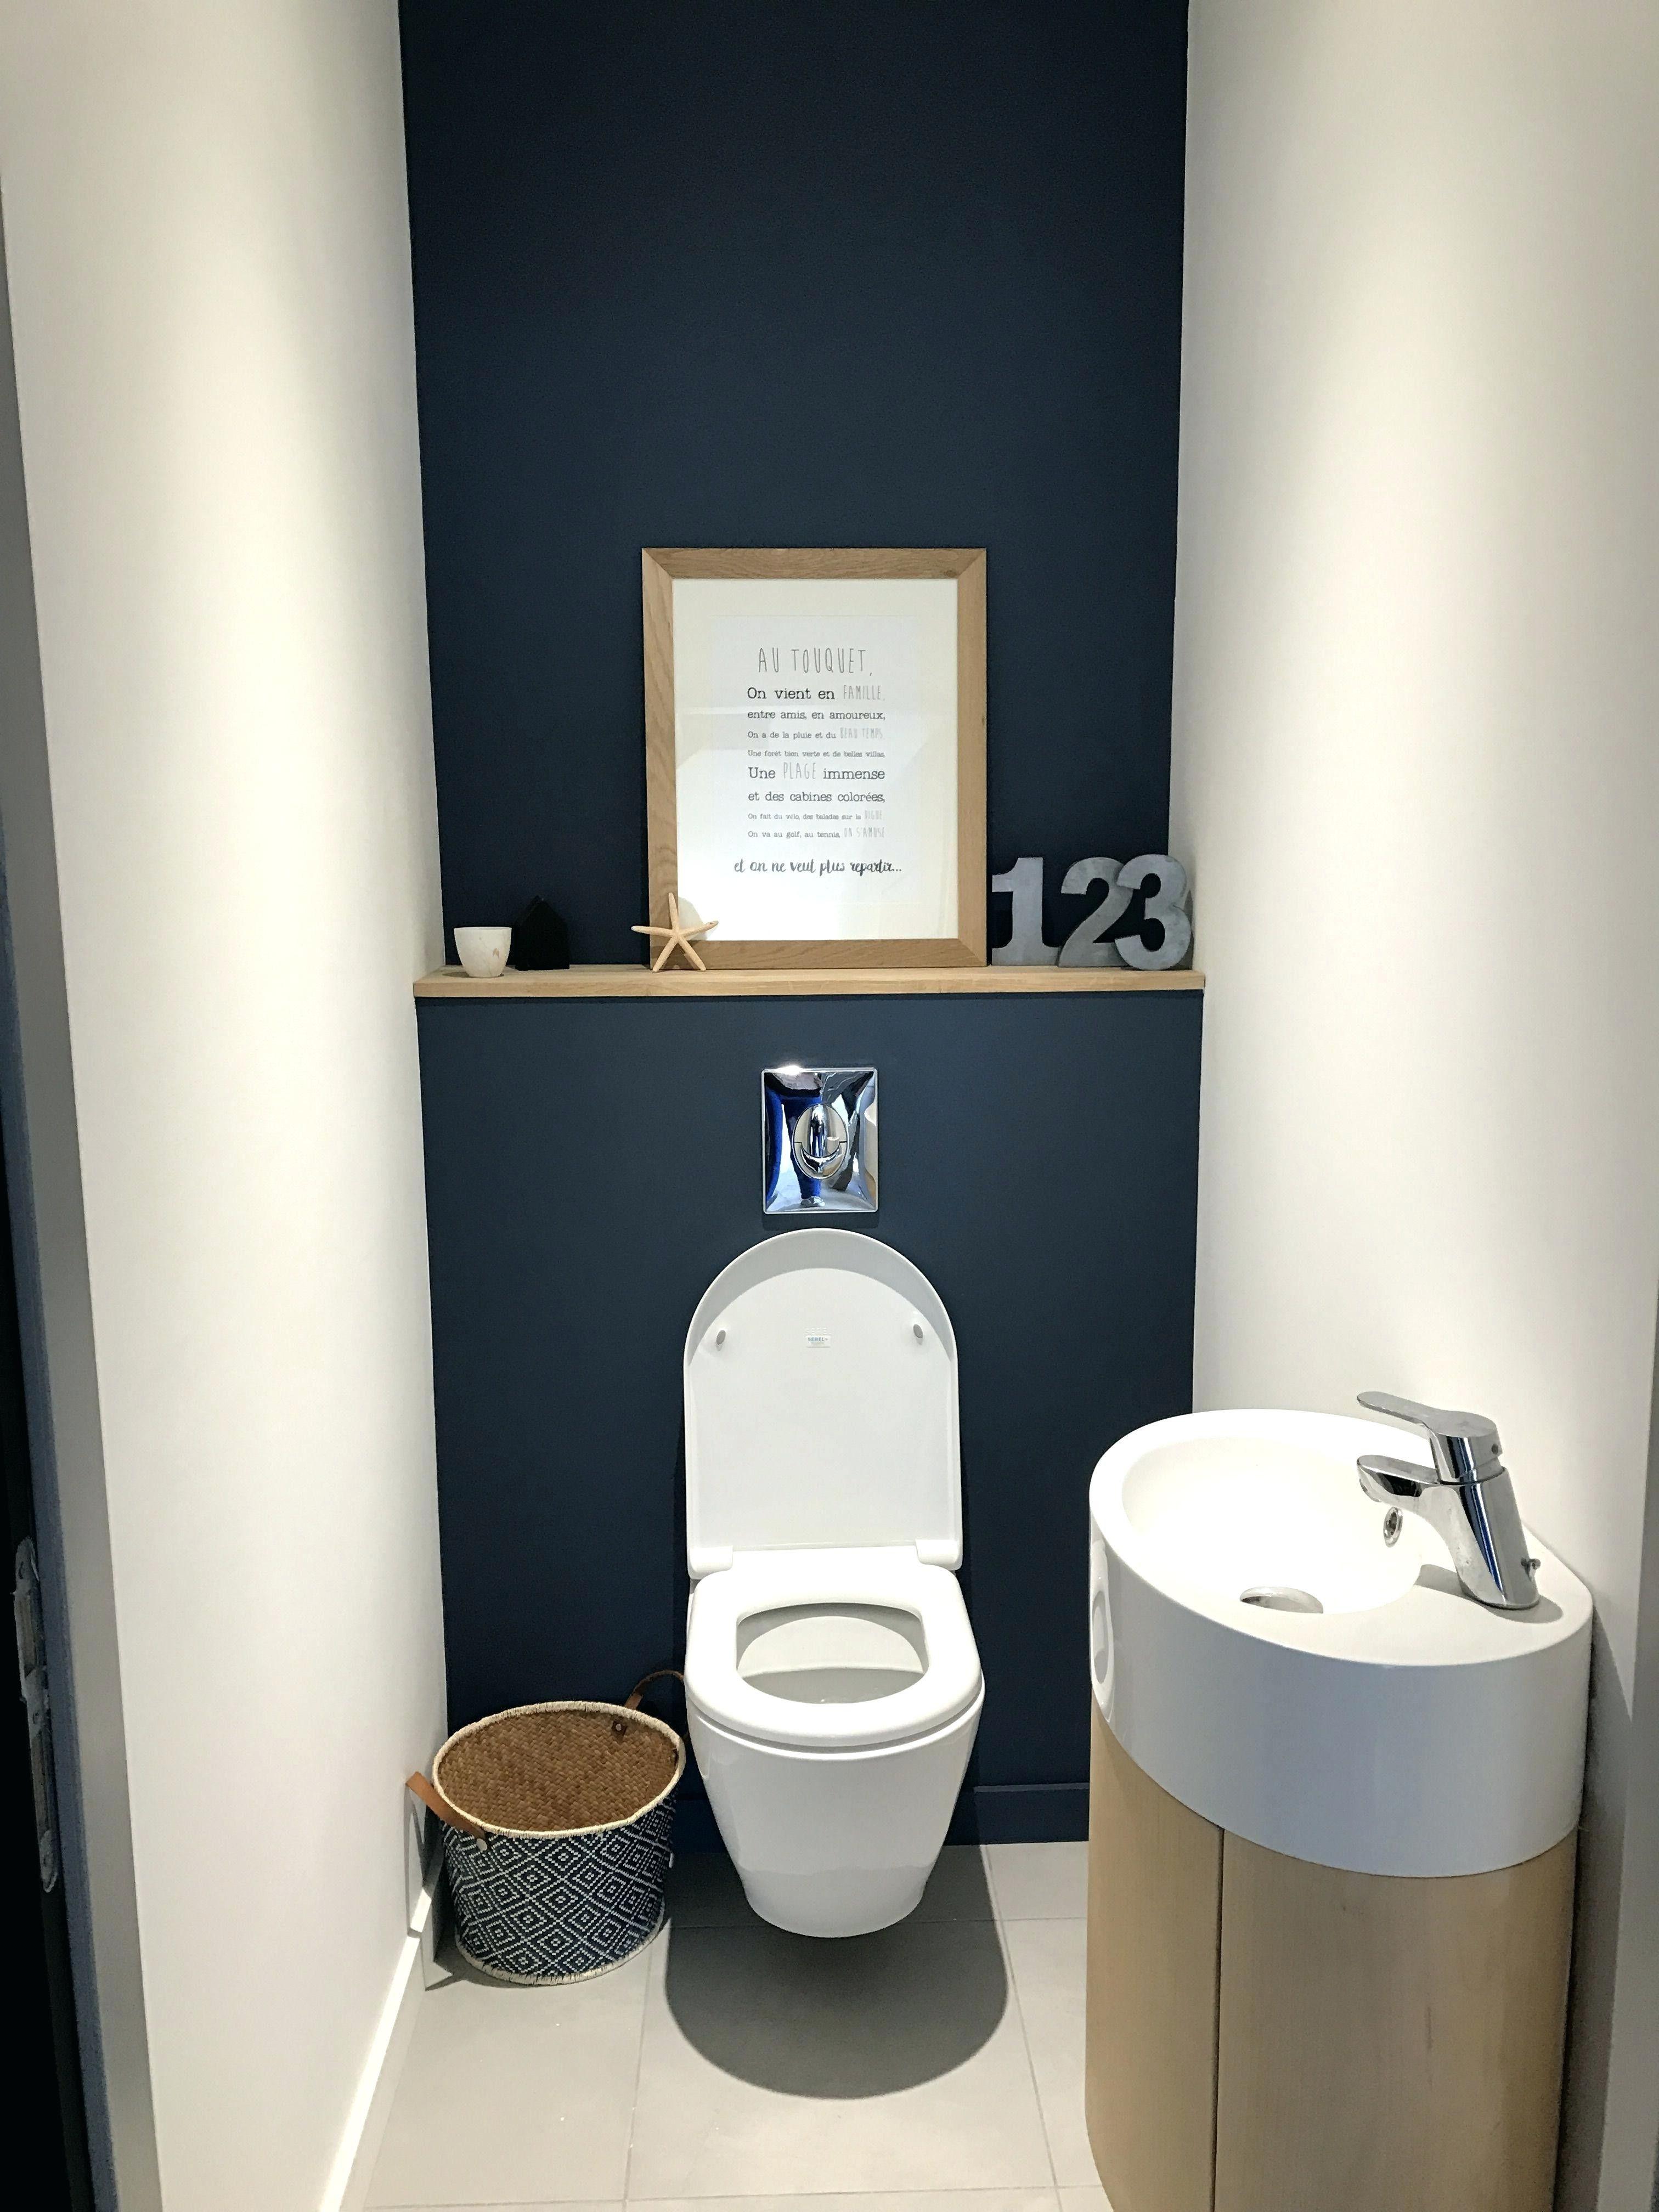 Wc Suspendu Estoril Deco Wc Suspendu Idee Deco Wc Suspendu Relooking Toilettes